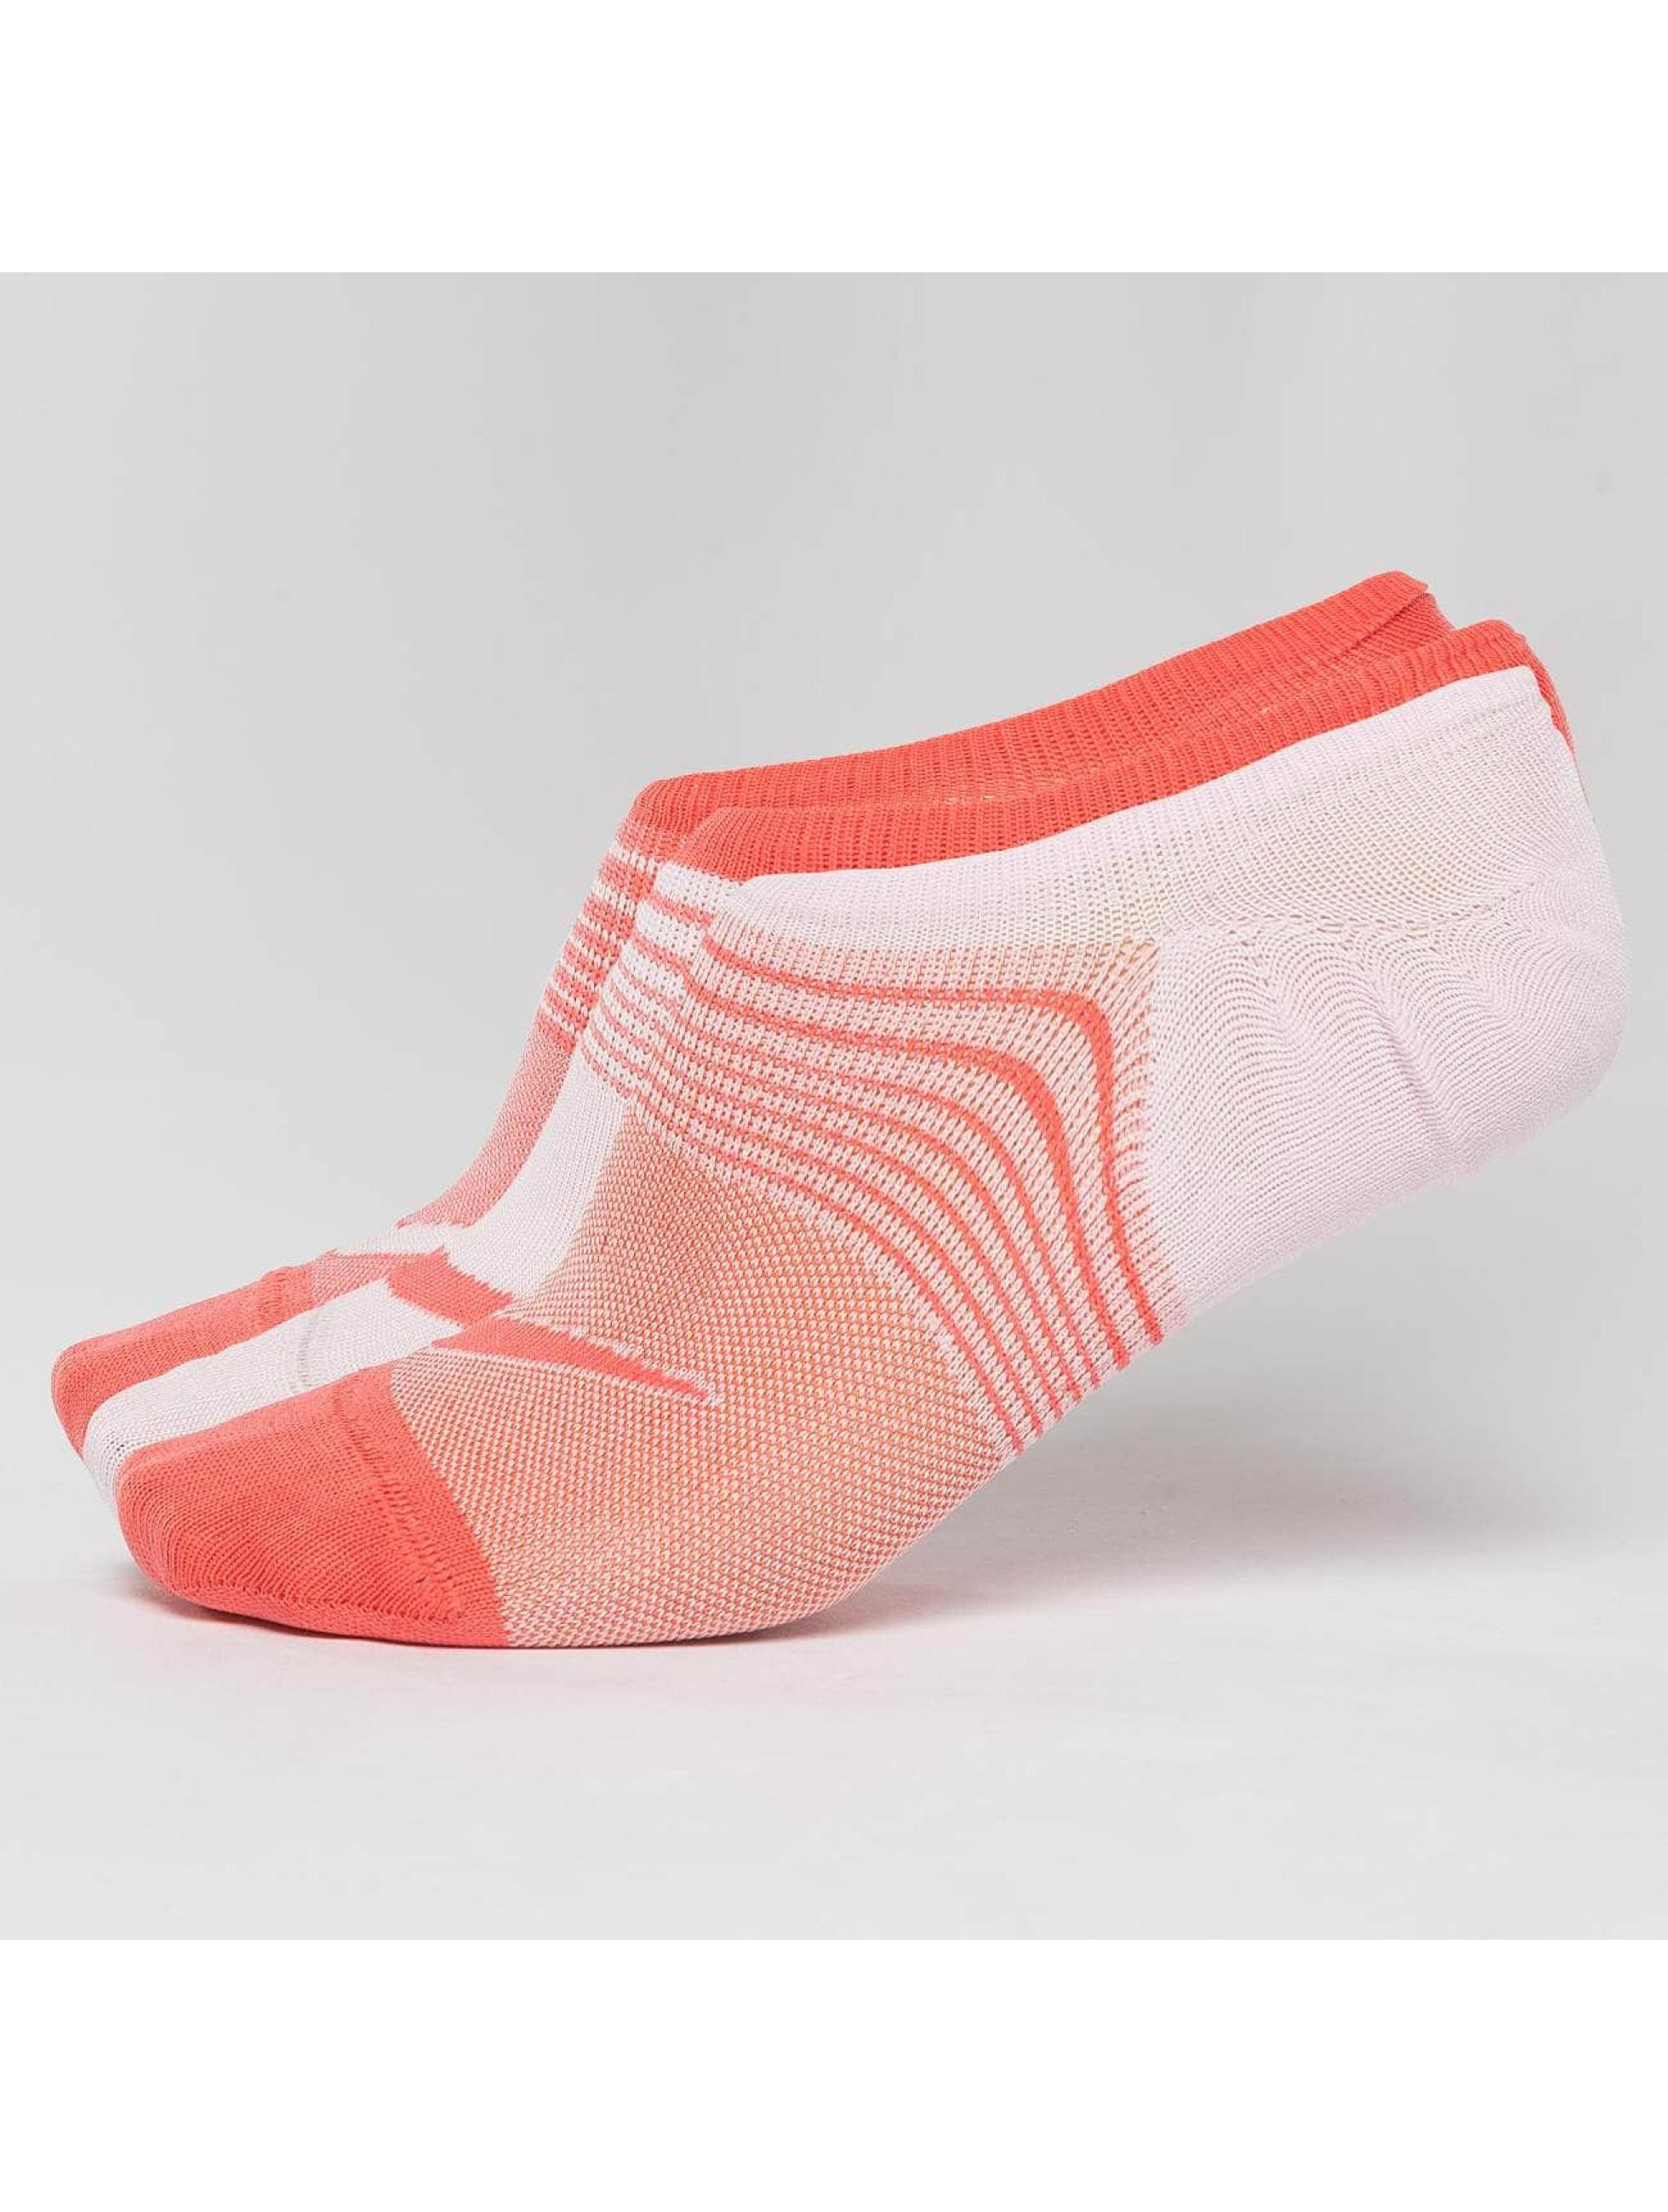 Nike Performance Sokker Everyday Plus Lightweight Training 3 Pack Footie oransje